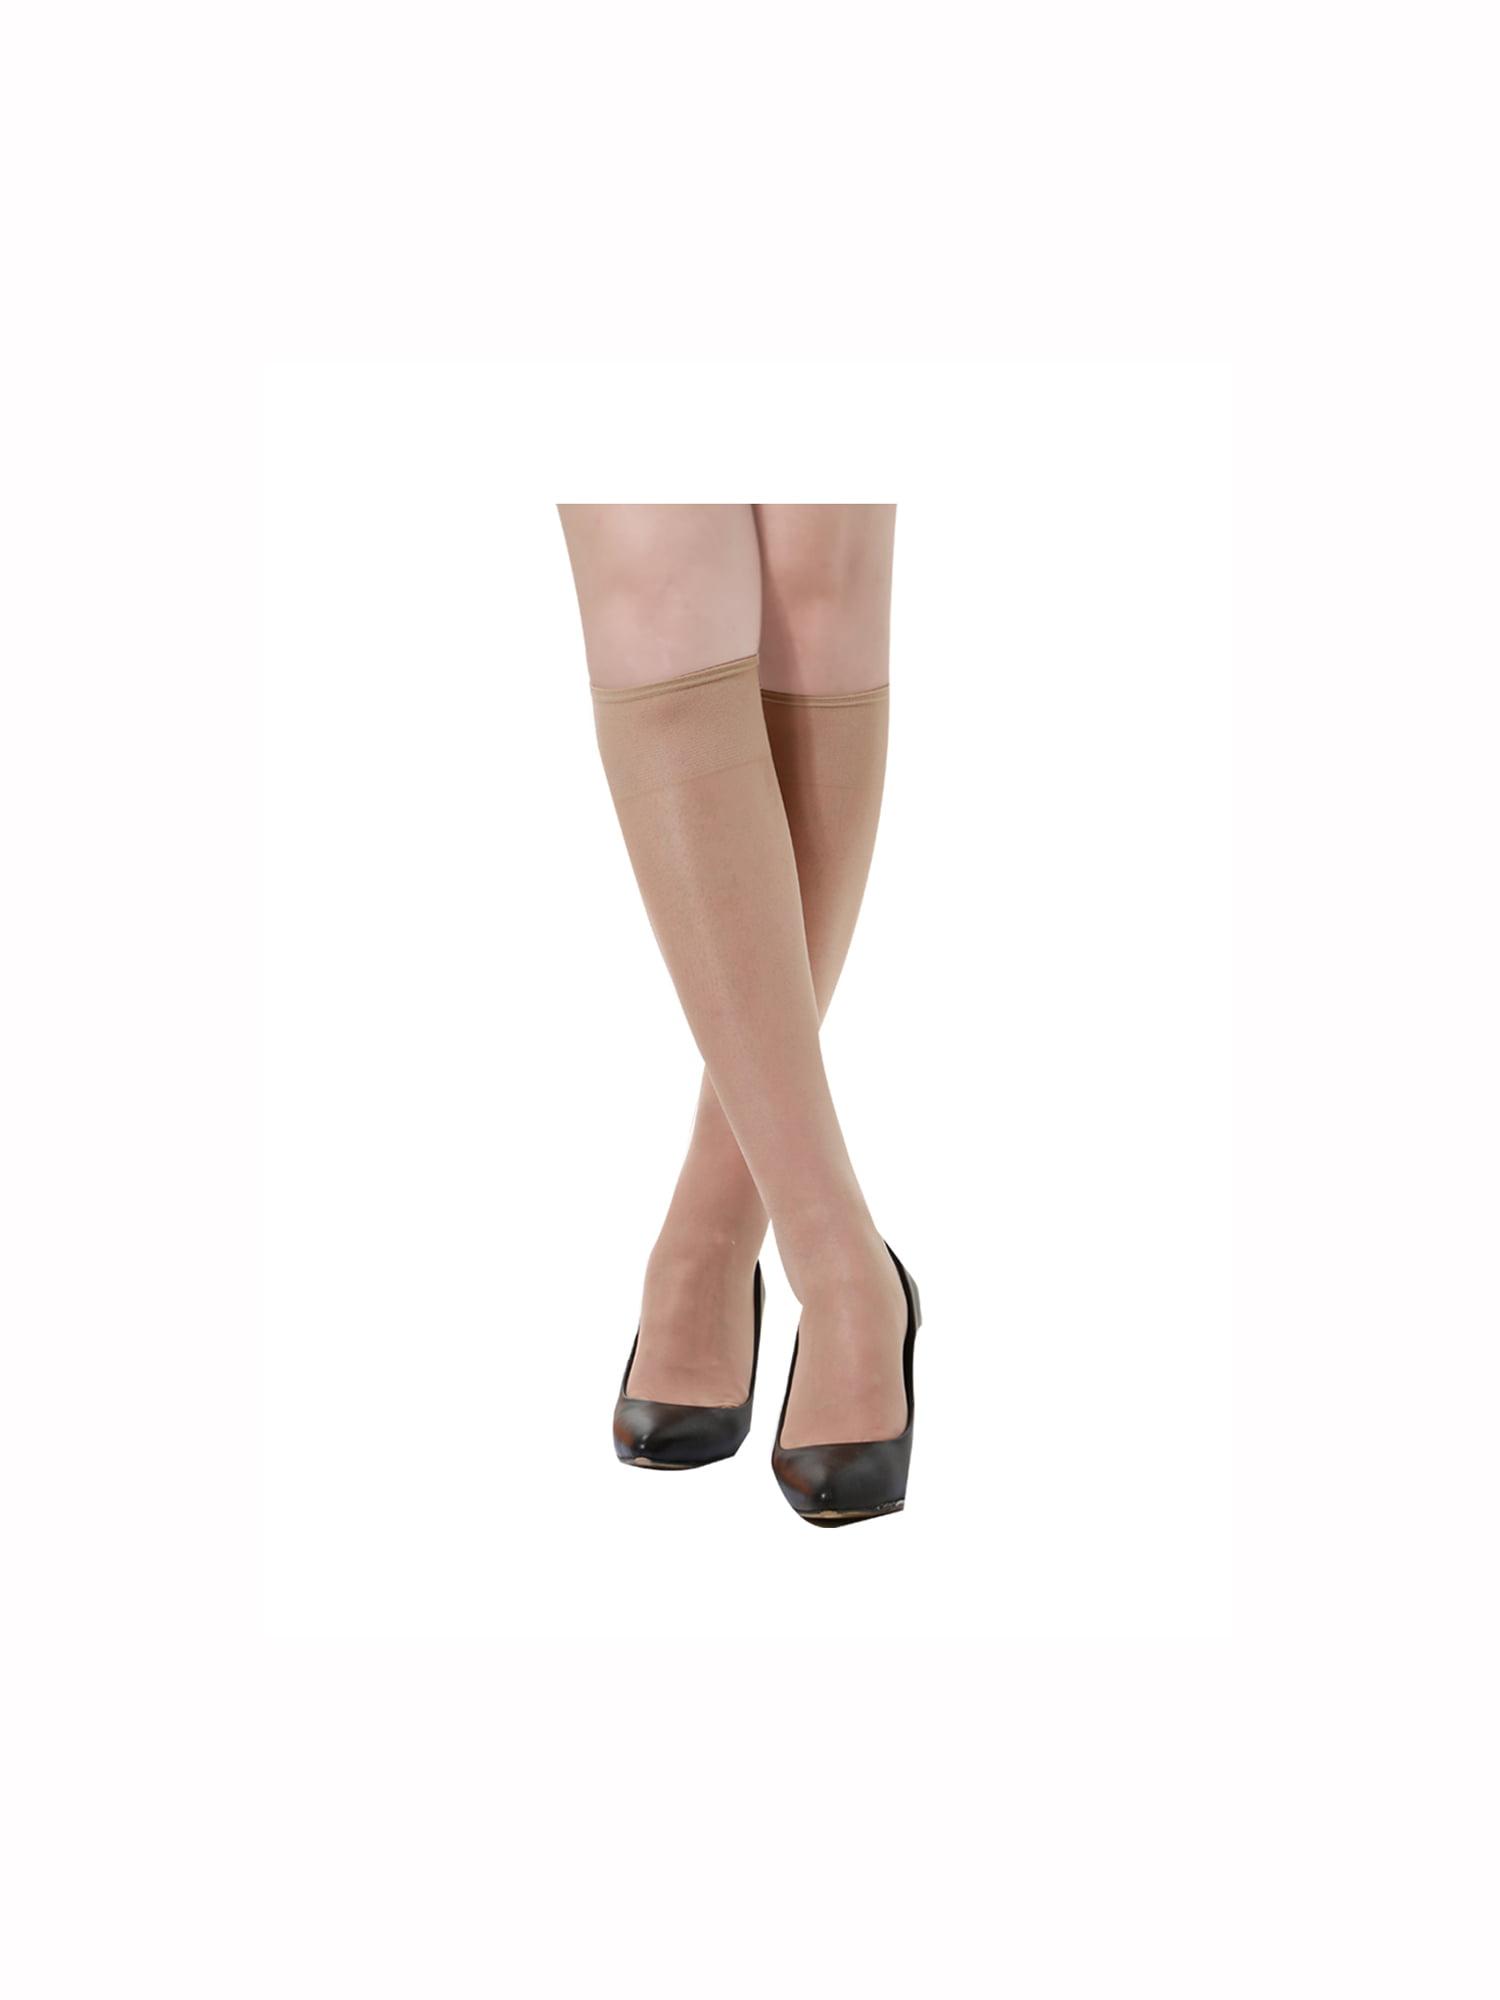 Unique Bargains Women's Knee High Silky Reinforced Toe Sheer Socks Stockings 10 Pack